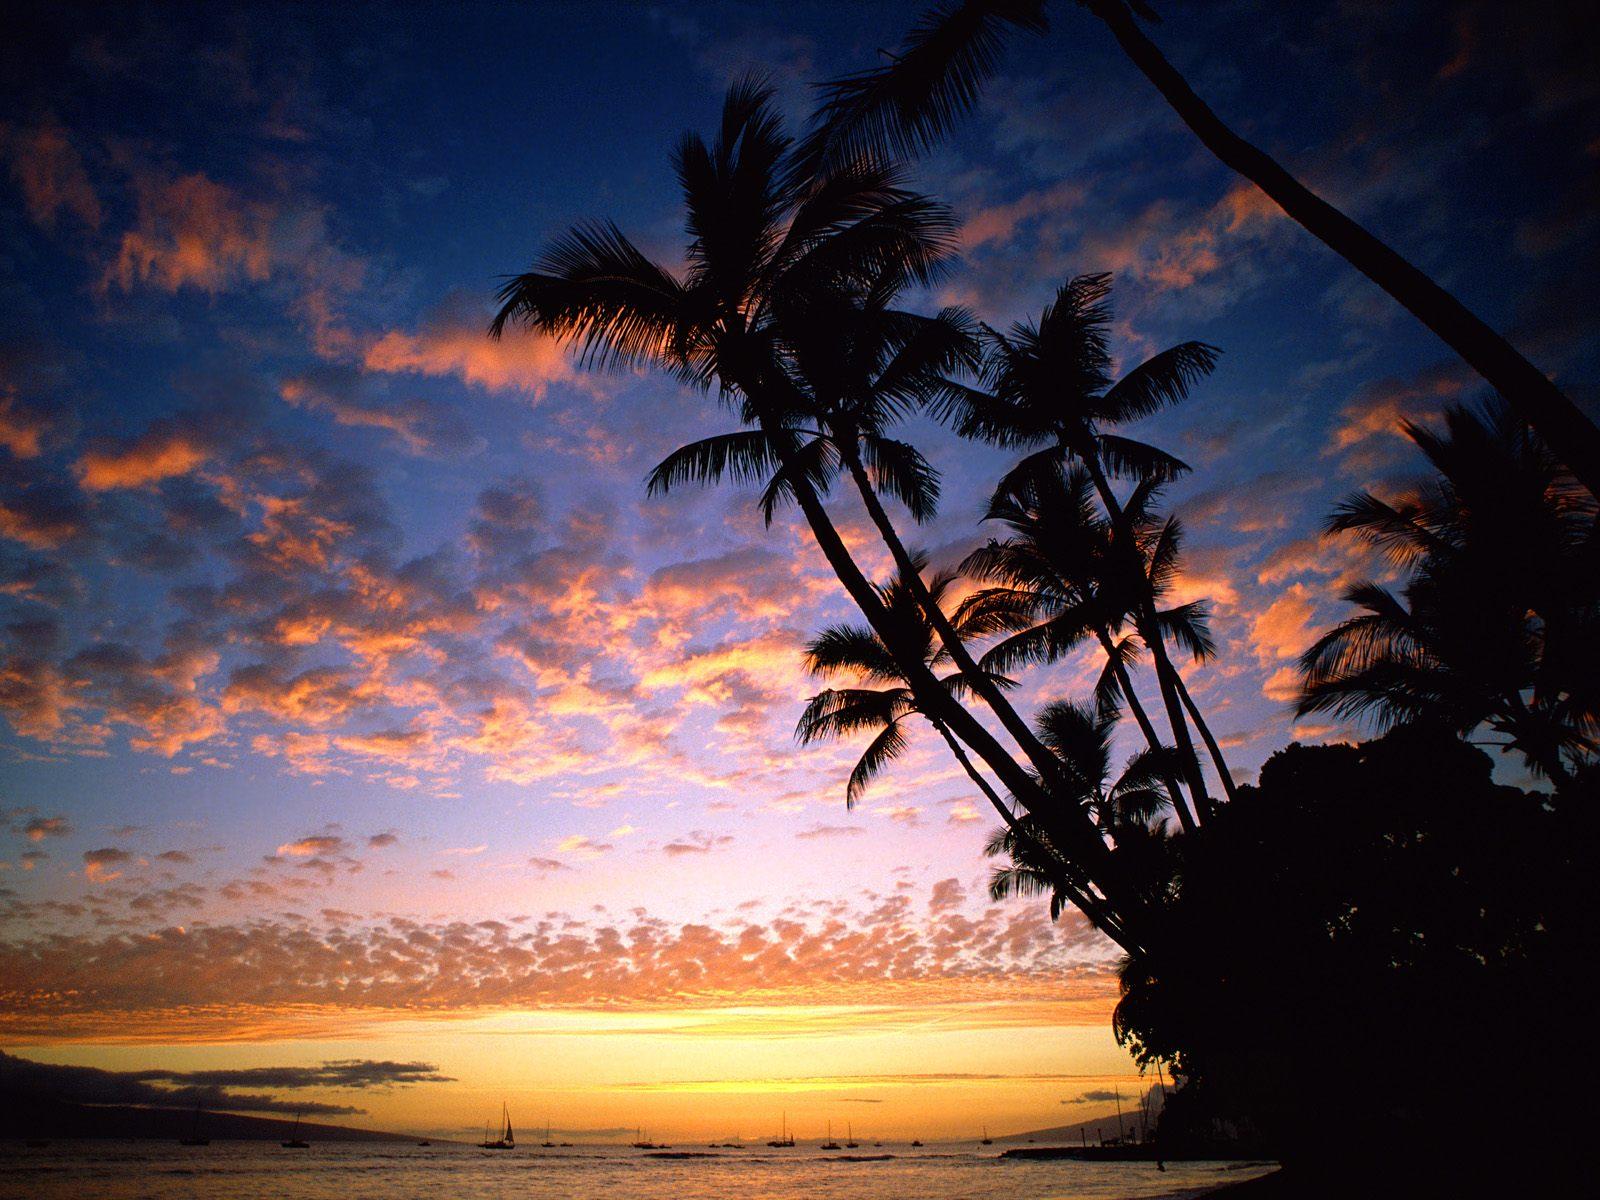 http://3.bp.blogspot.com/-2HRsMXEMGPU/ThKnPikk7UI/AAAAAAAAA6U/4BTpGcqok_U/s1600/nature-wallpaper-afterglow-hawaii.jpg